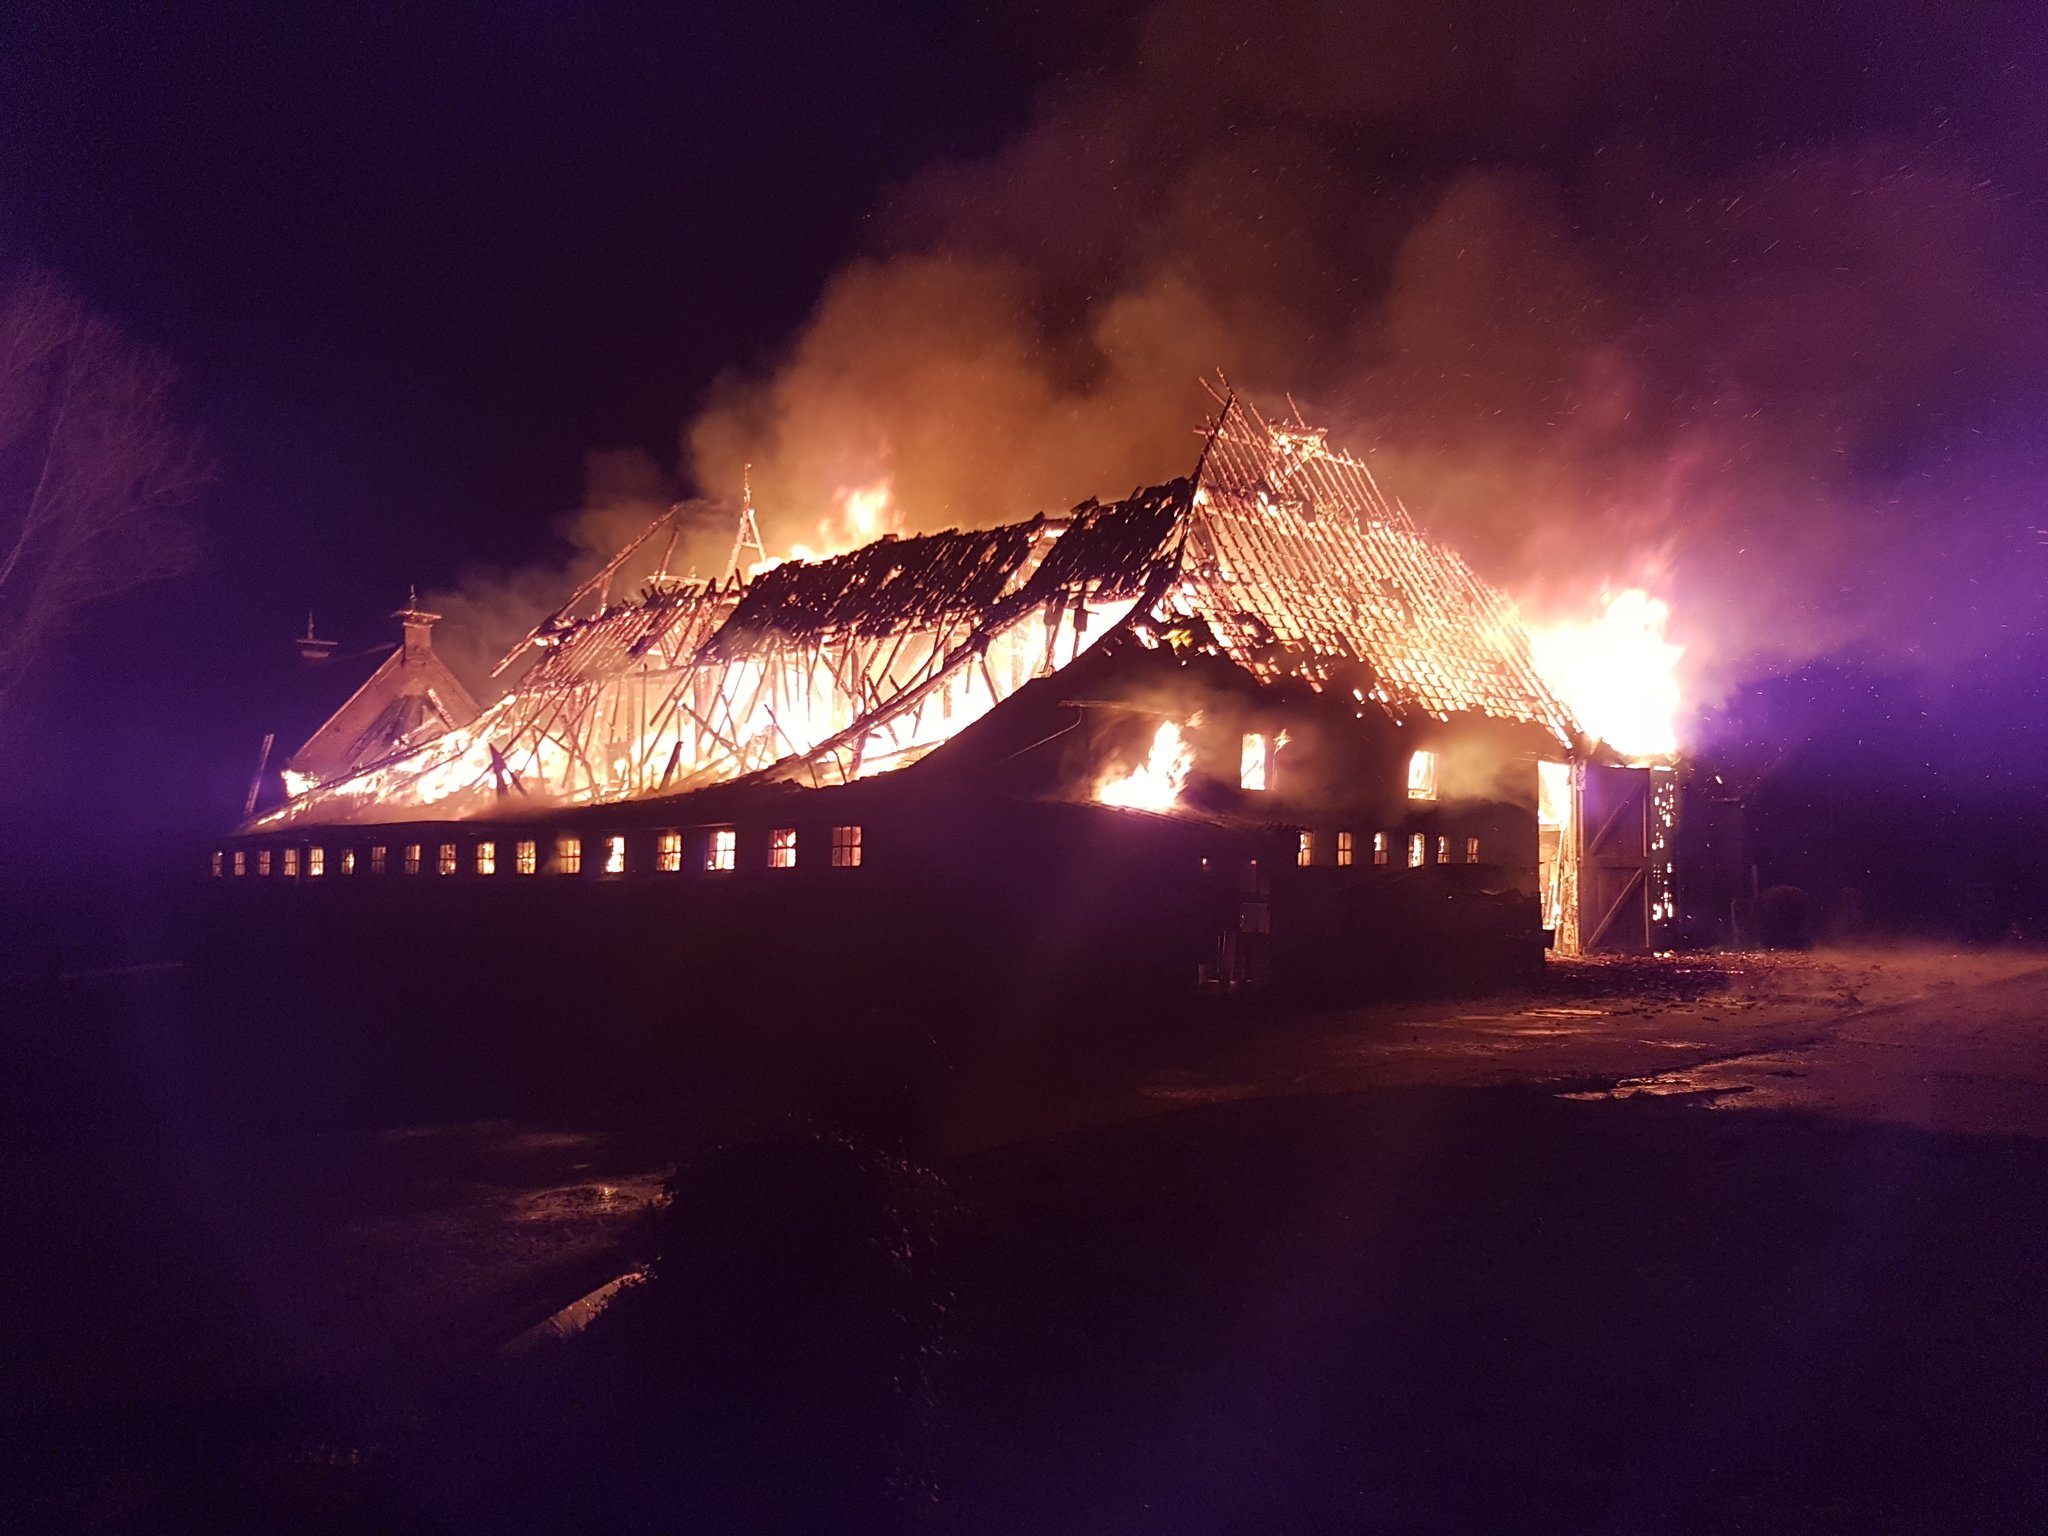 Grote brand in boerderij